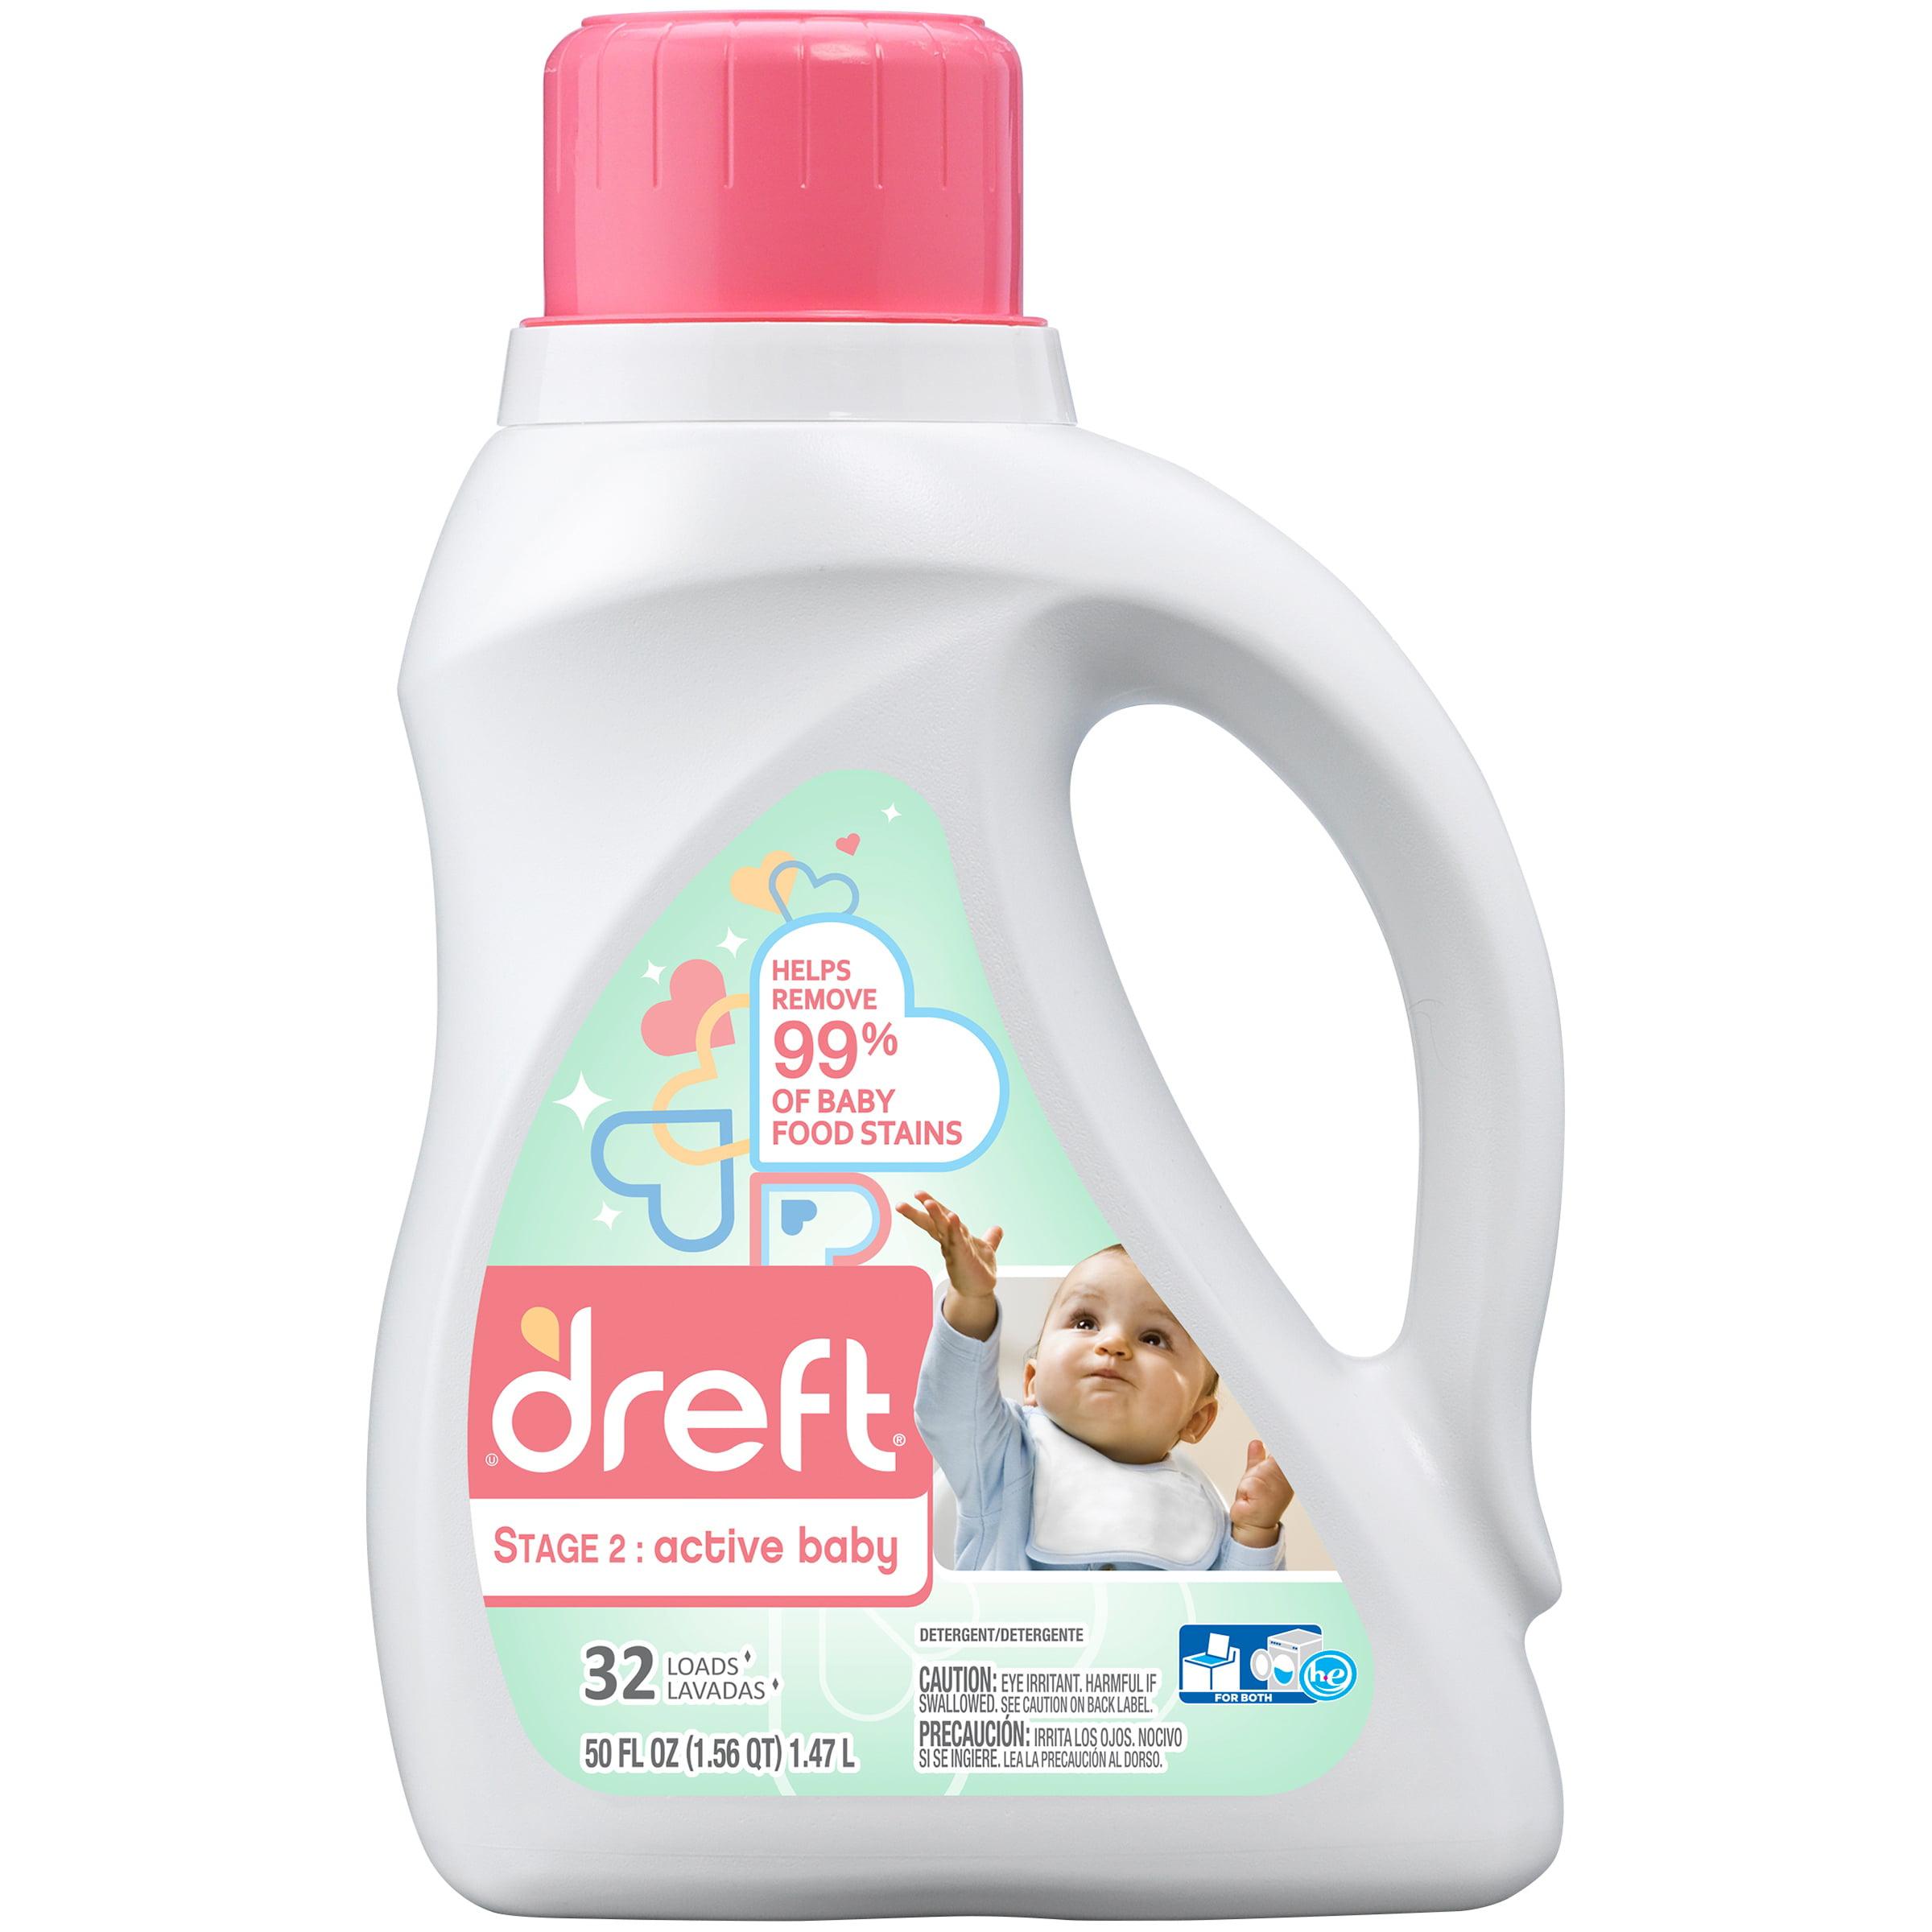 Dreft® Stage 2: Active Baby Liquid Laundry Detergent 50 fl. oz. Jug